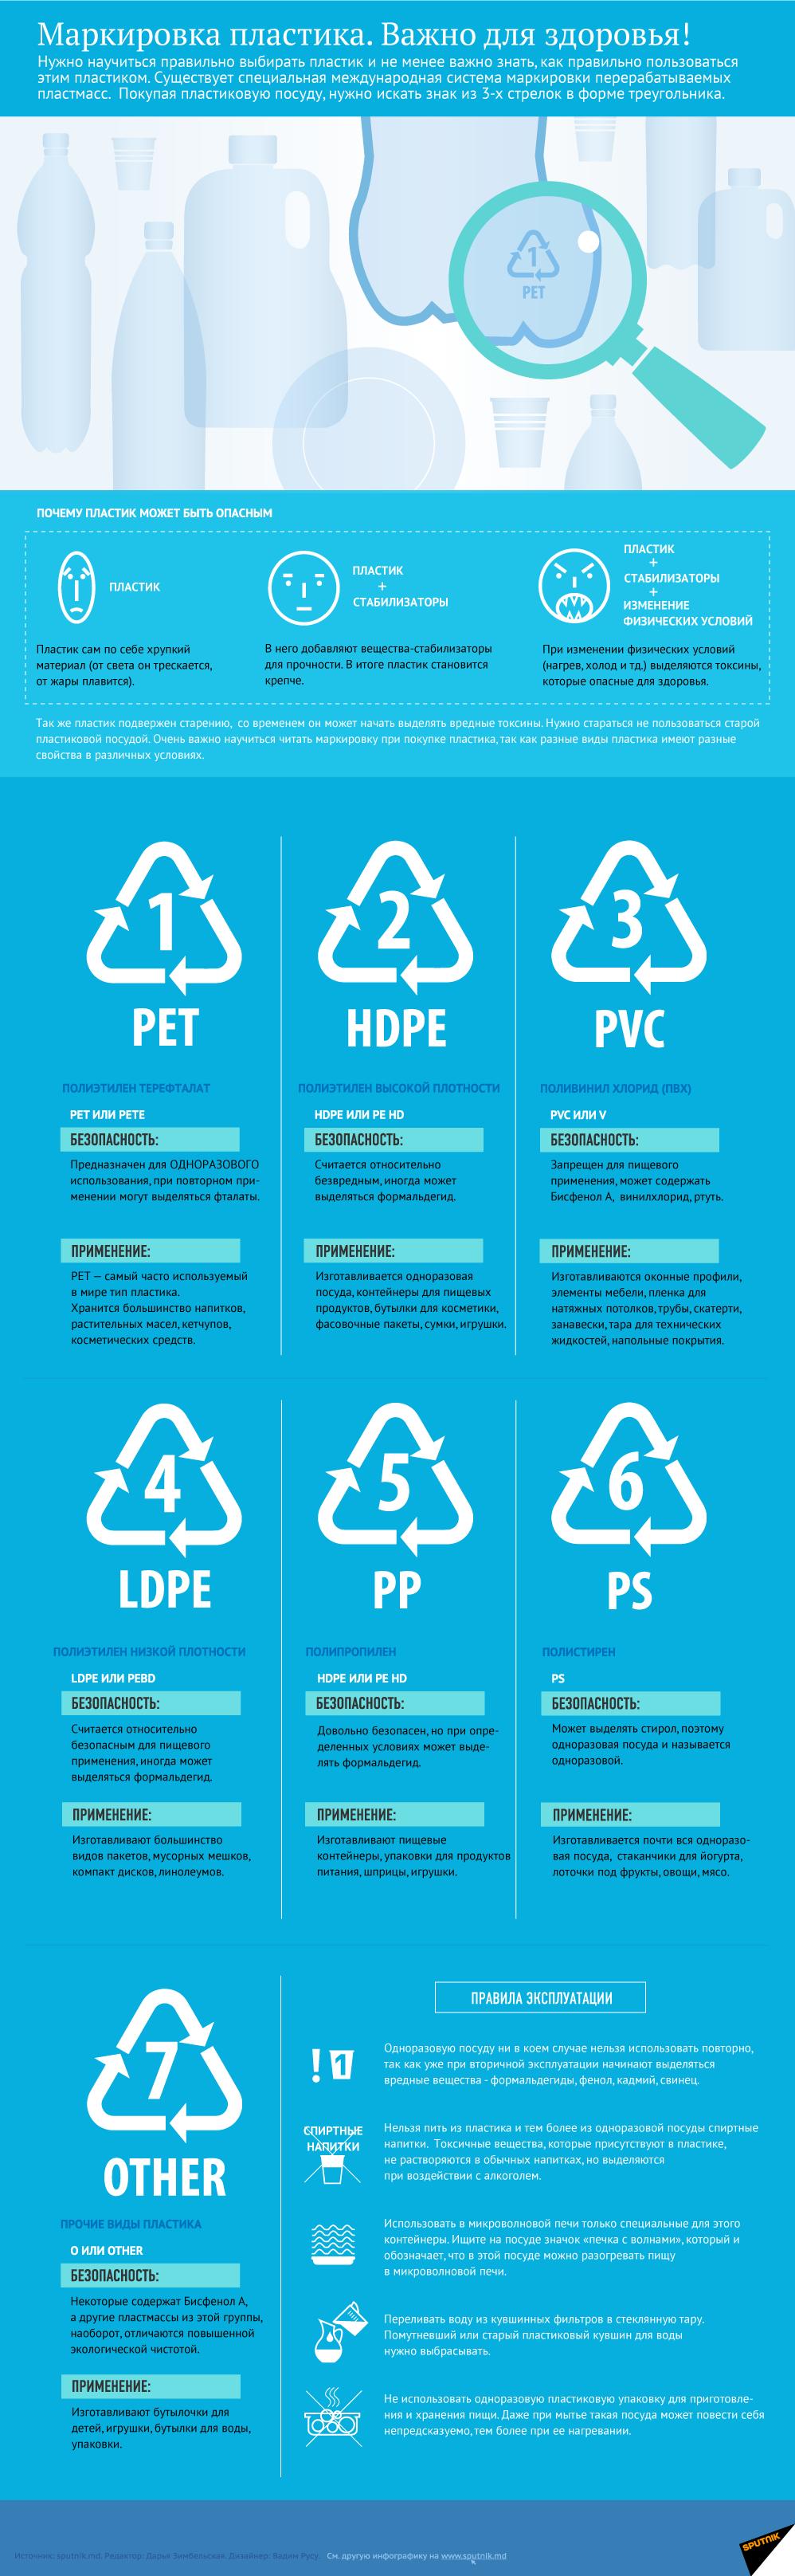 Маркировка пластика. Важно для здоровья - Sputnik Азербайджан